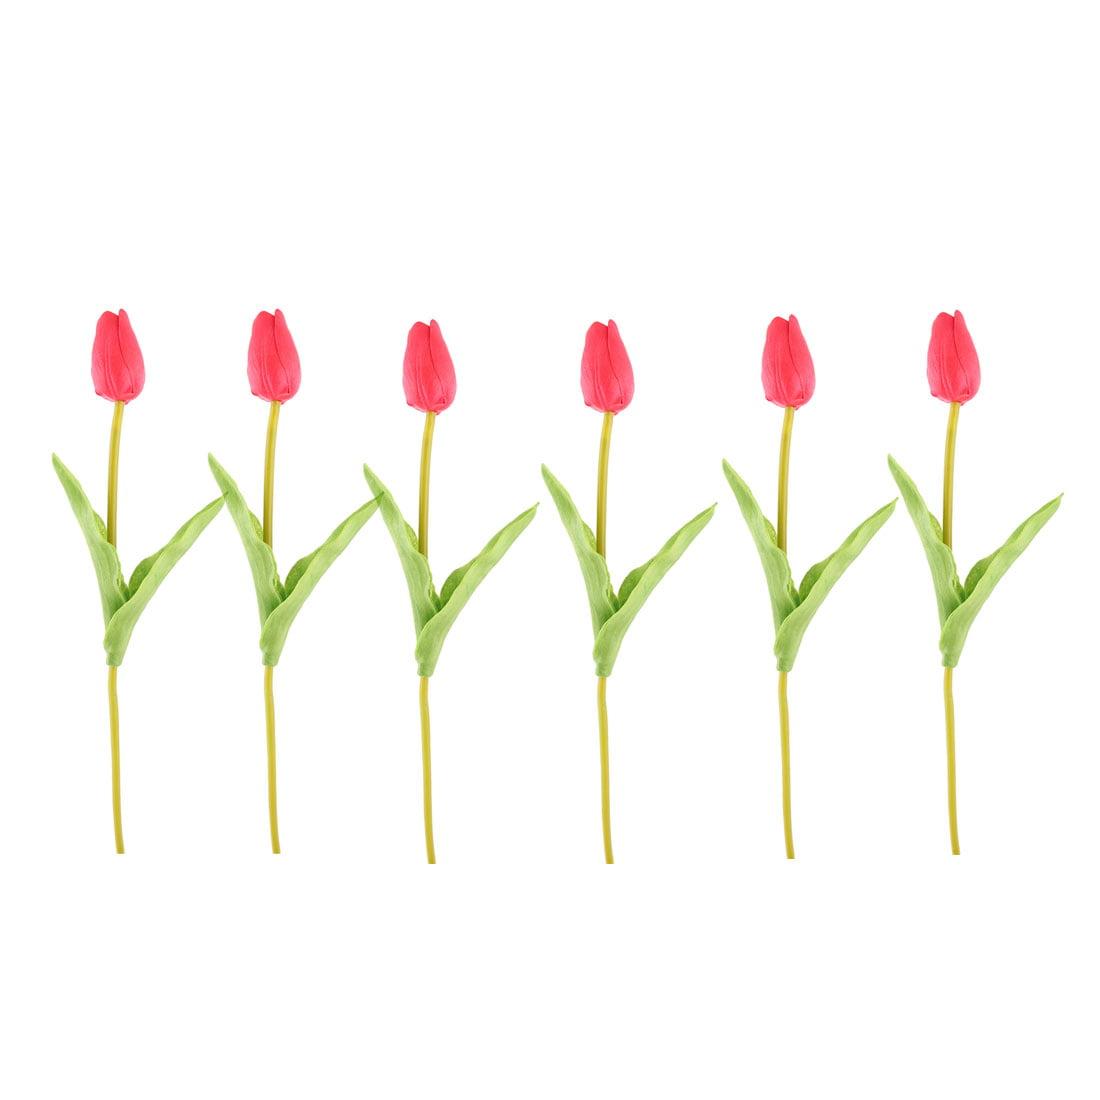 Wedding Tulip Design Handhold Artificial Flower Bouquet Red 13 Inch Height 6pcs